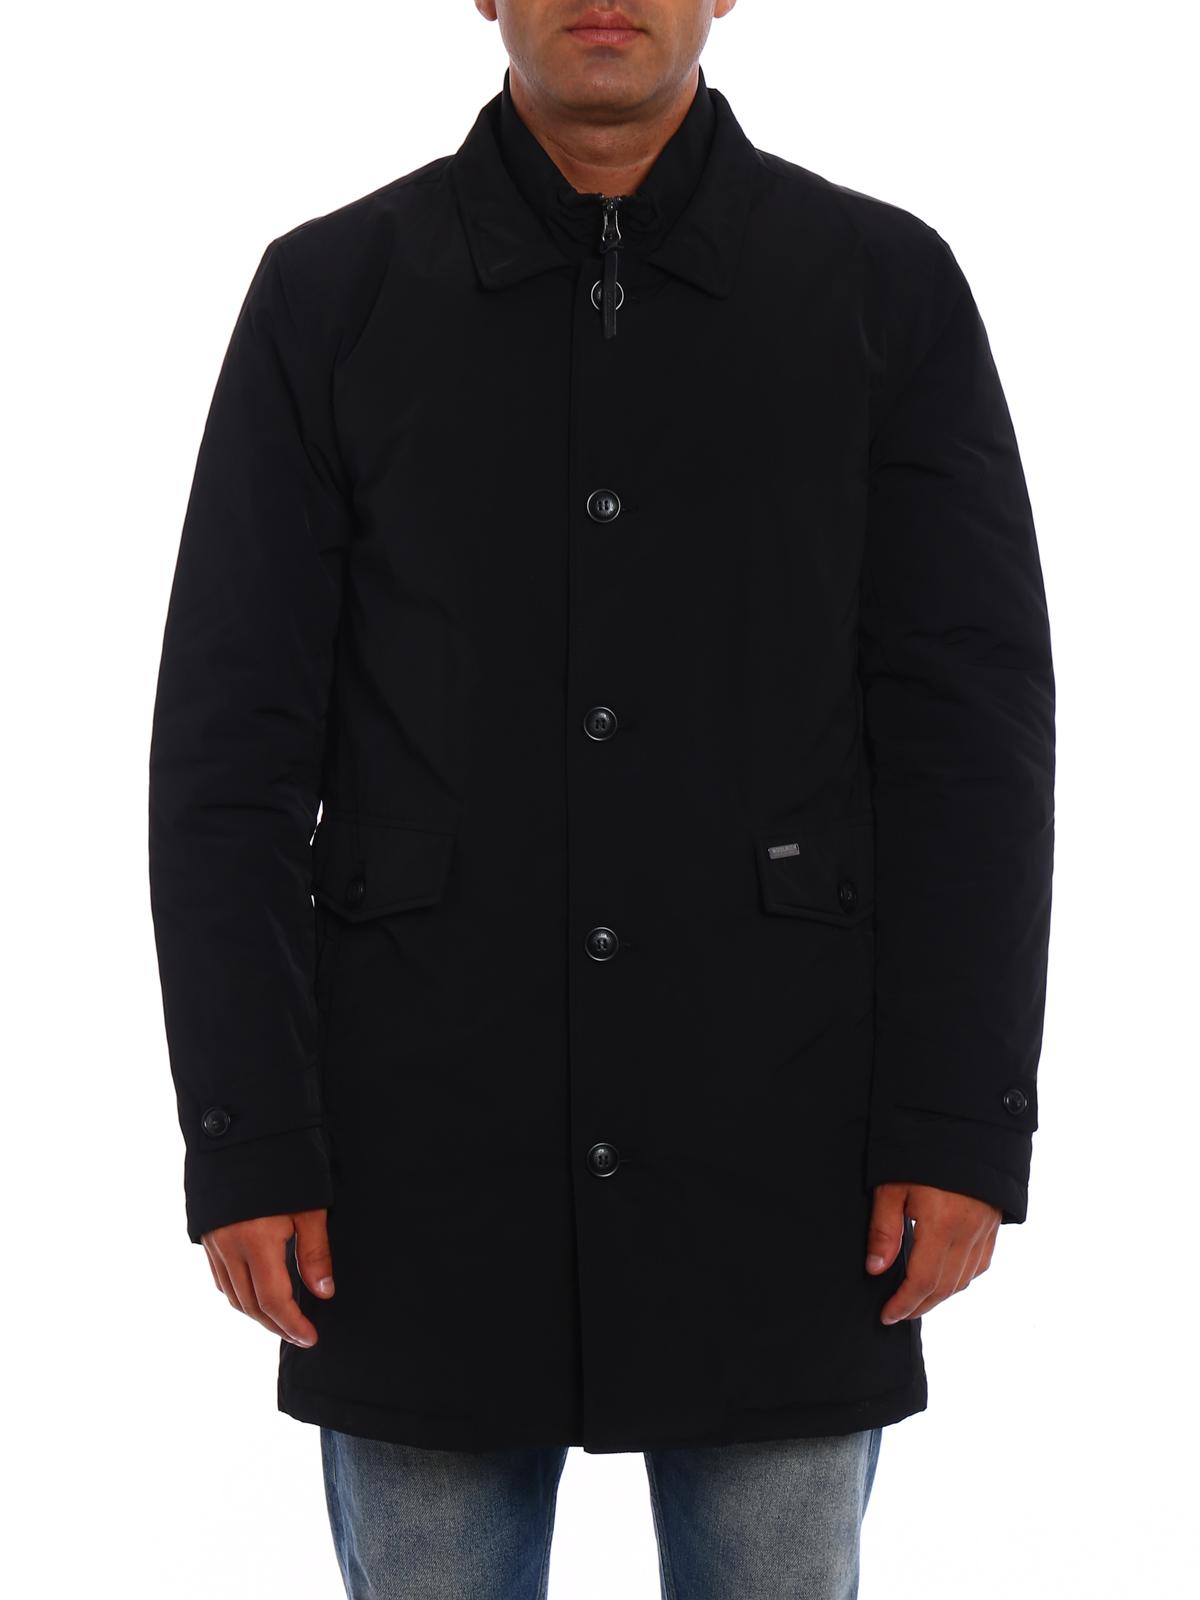 c9de1b9f8c6c iKRIX WOOLRICH  padded coats - Turner wind proof black warm coat